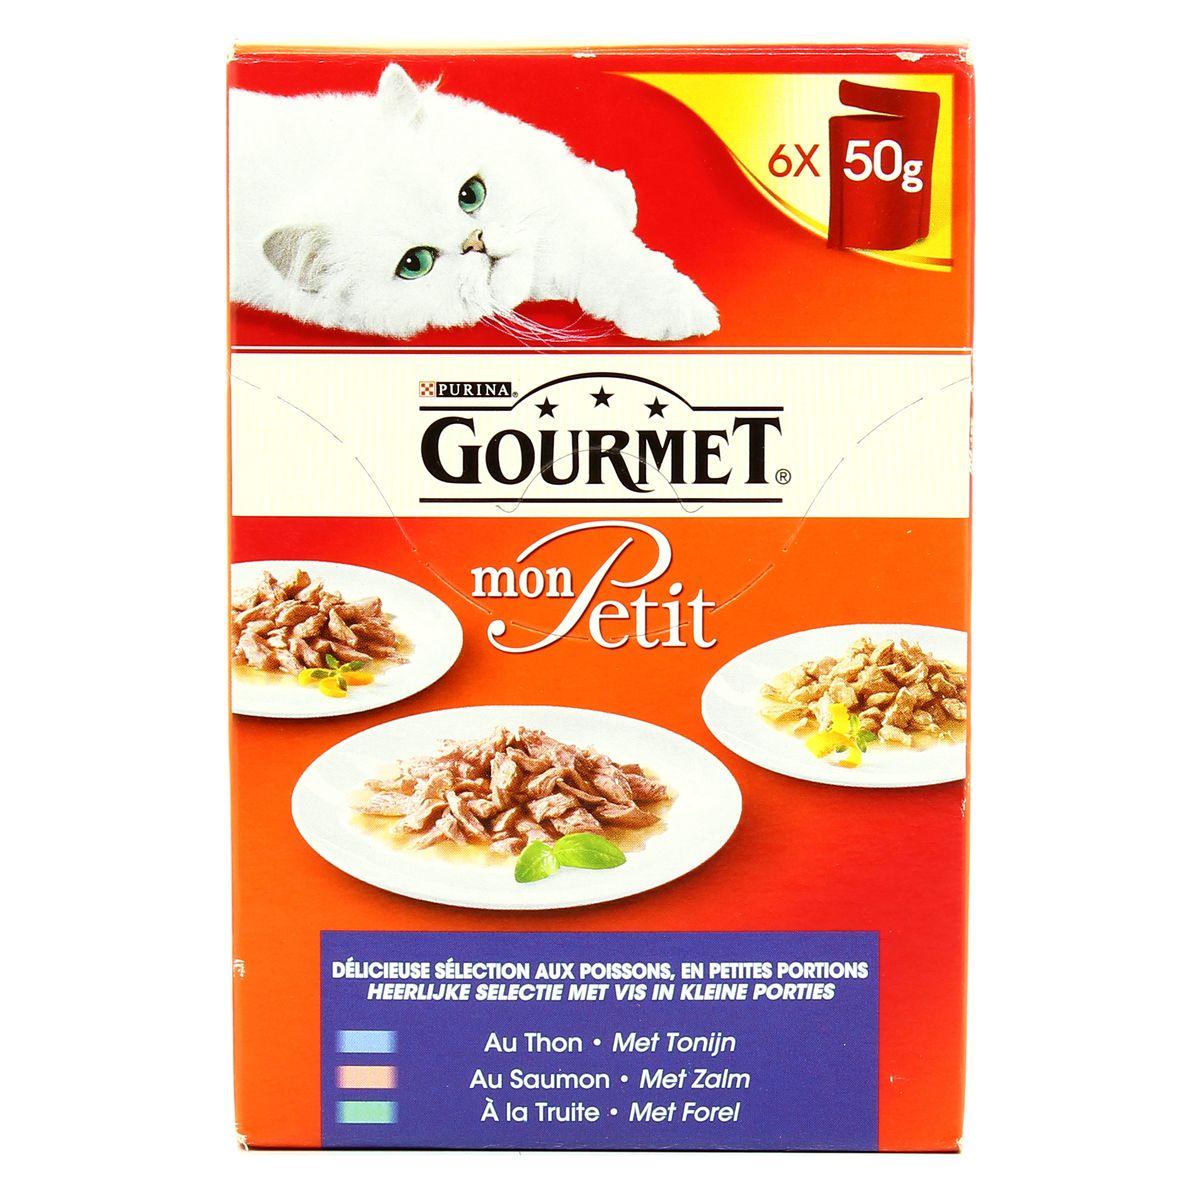 Mon Petit Gourmet poisson pour chat, thon, saumon, truite (6 x 50 g)